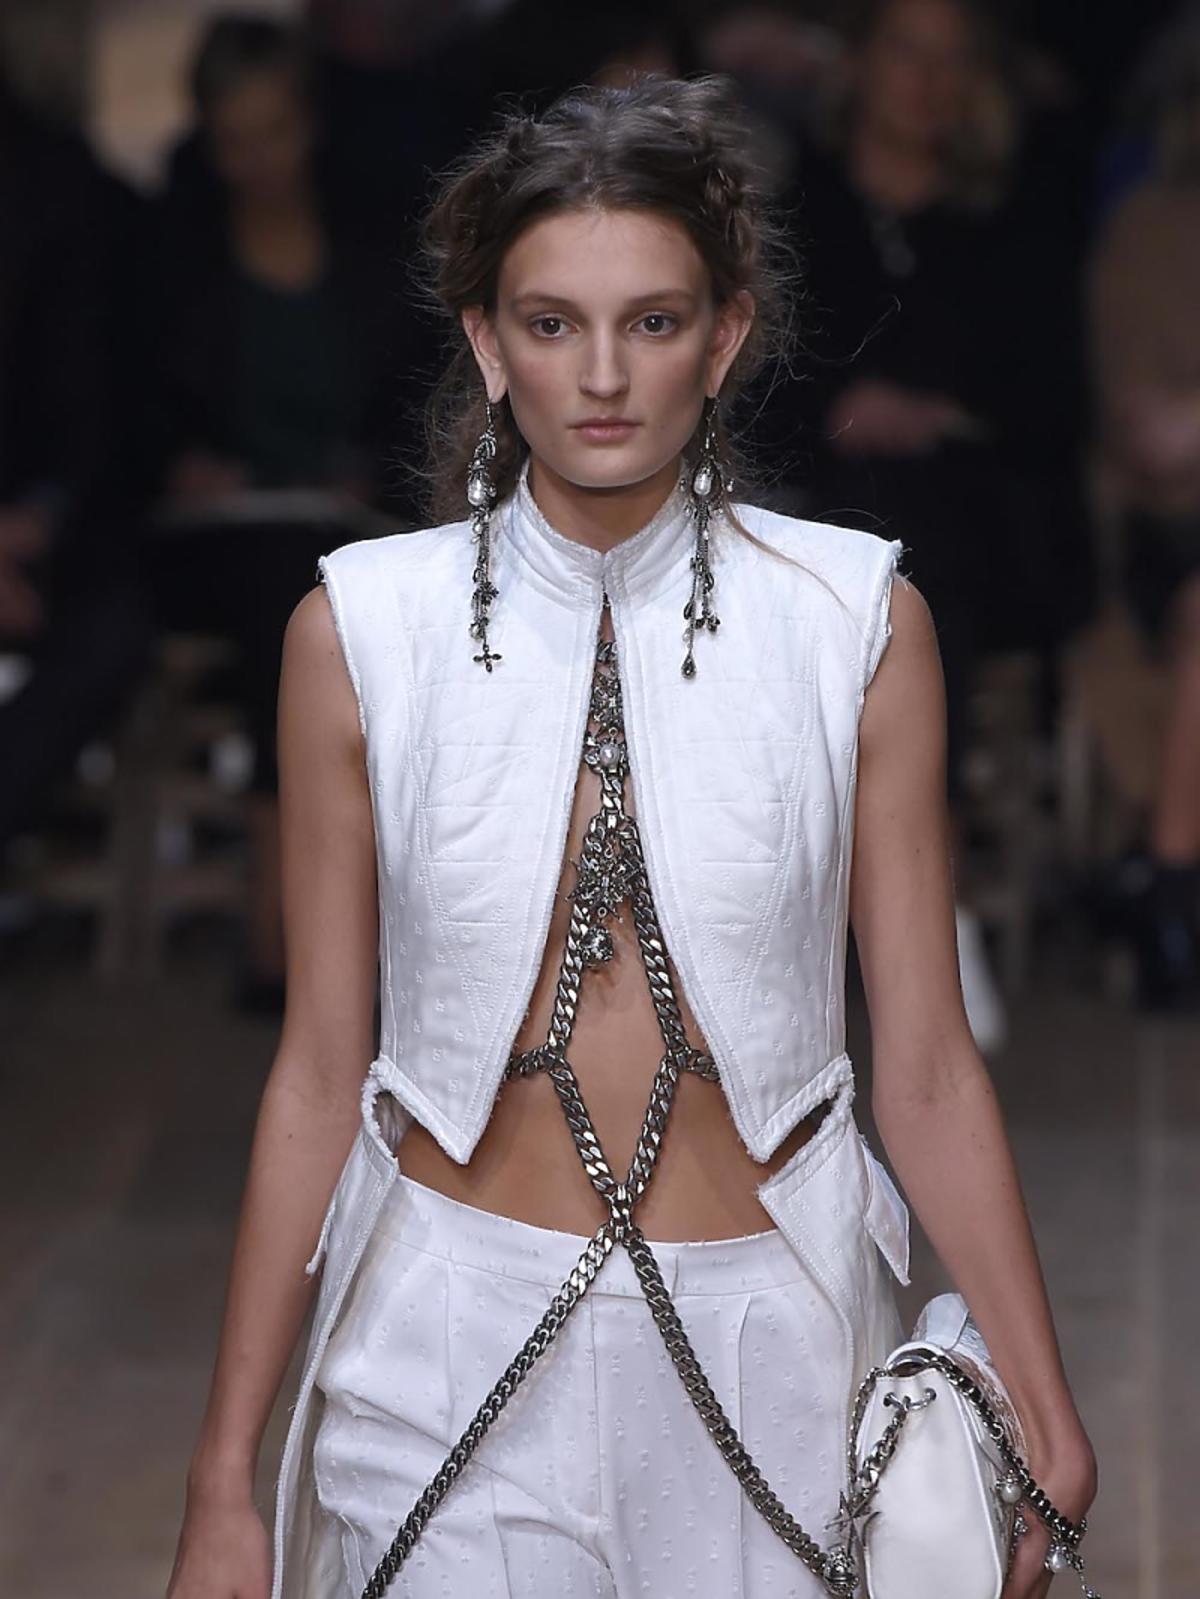 Modelka na pokazie Alexander McQueen